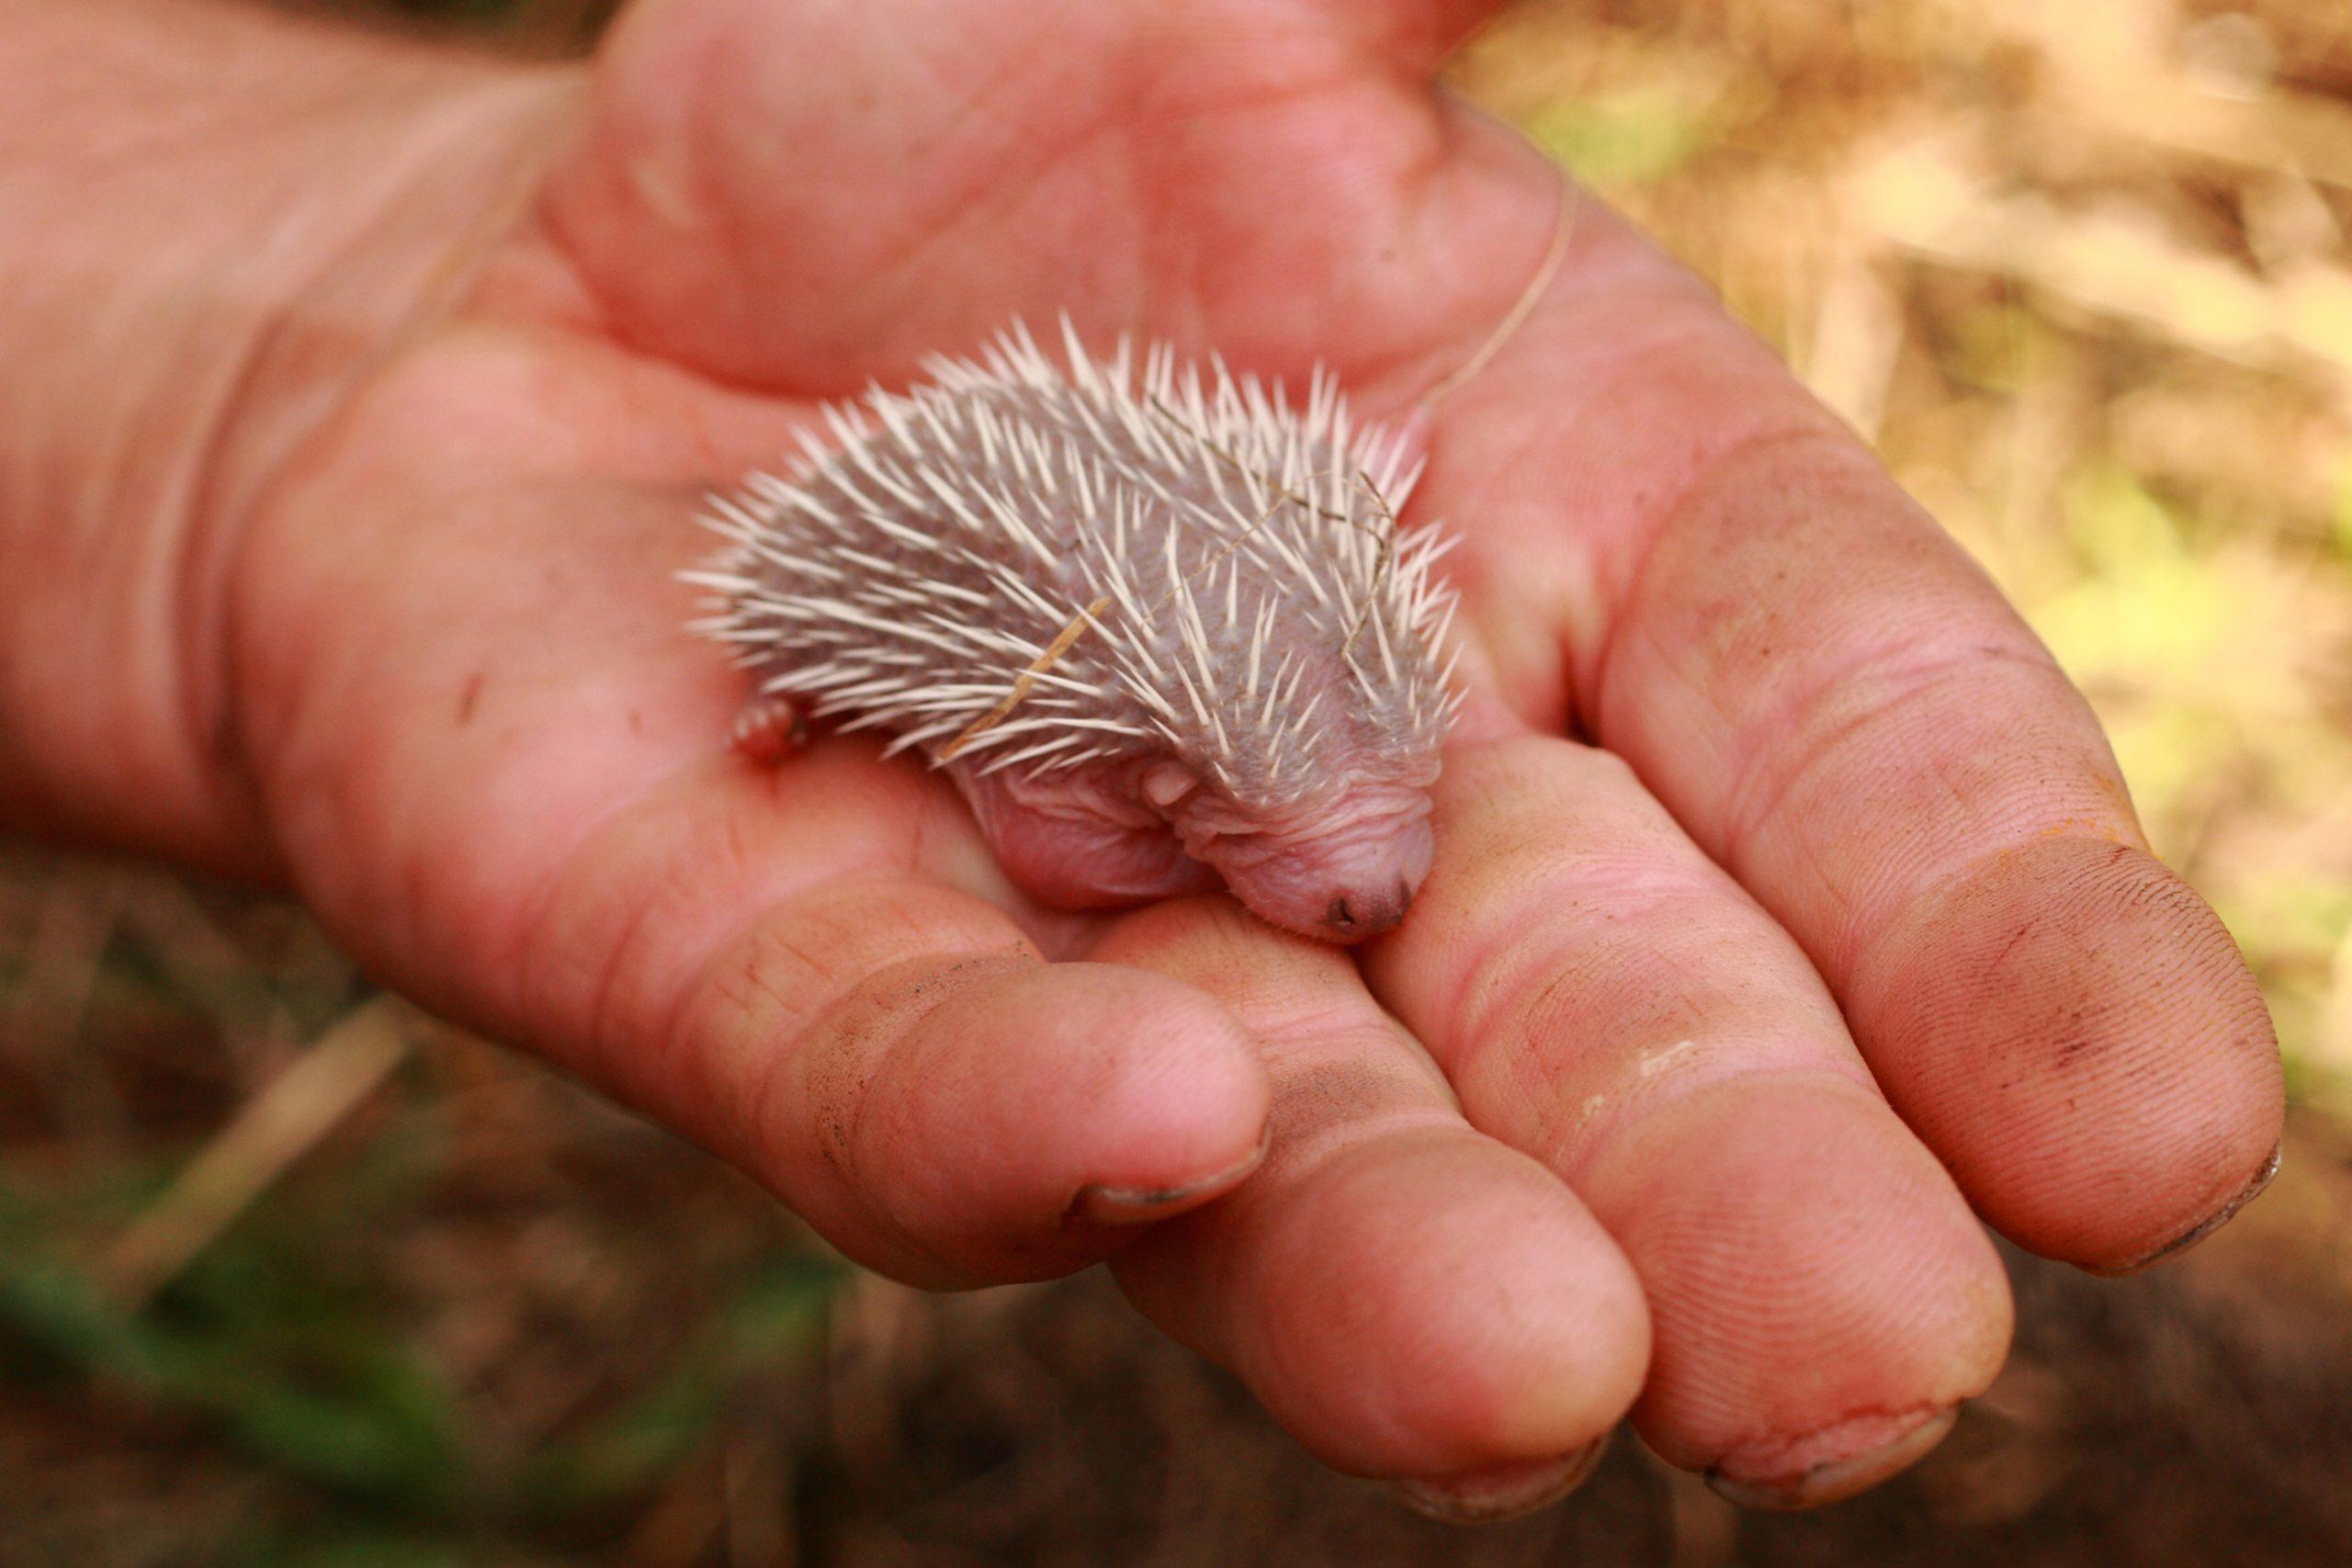 small hedgehog (newborn)